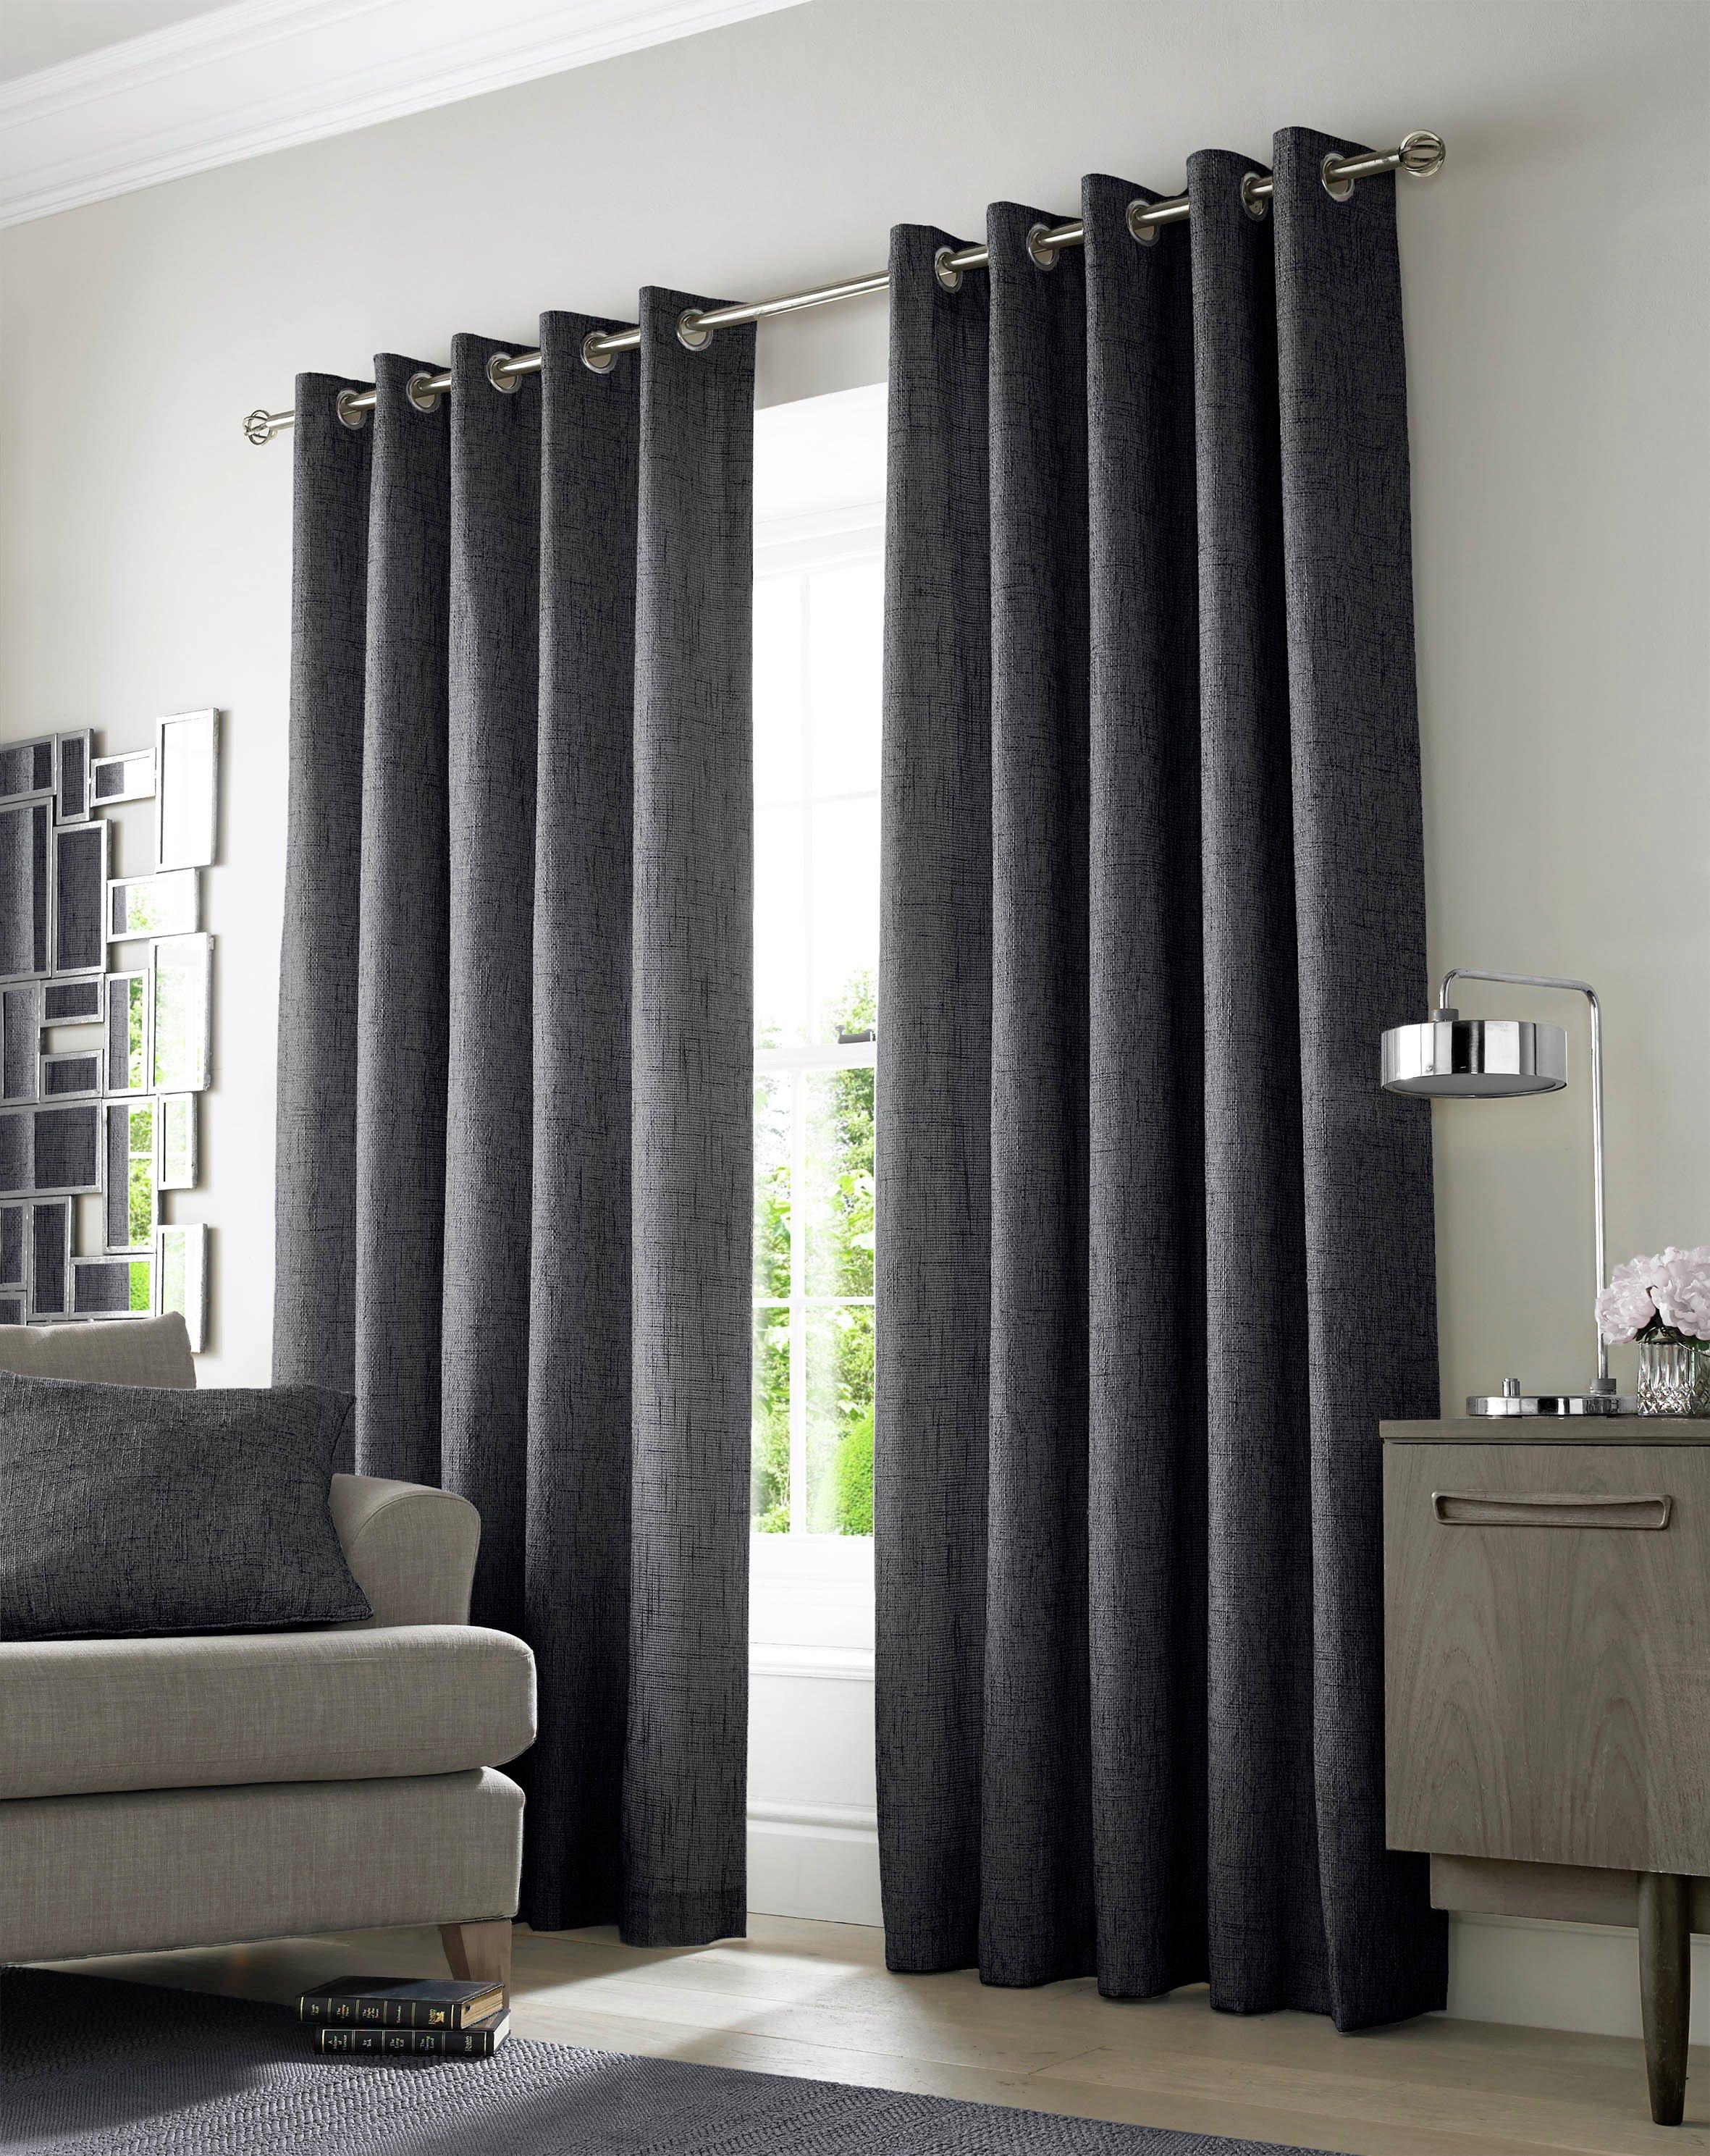 Academy Eyelet Curtains - 165x137cm - Charcoal.